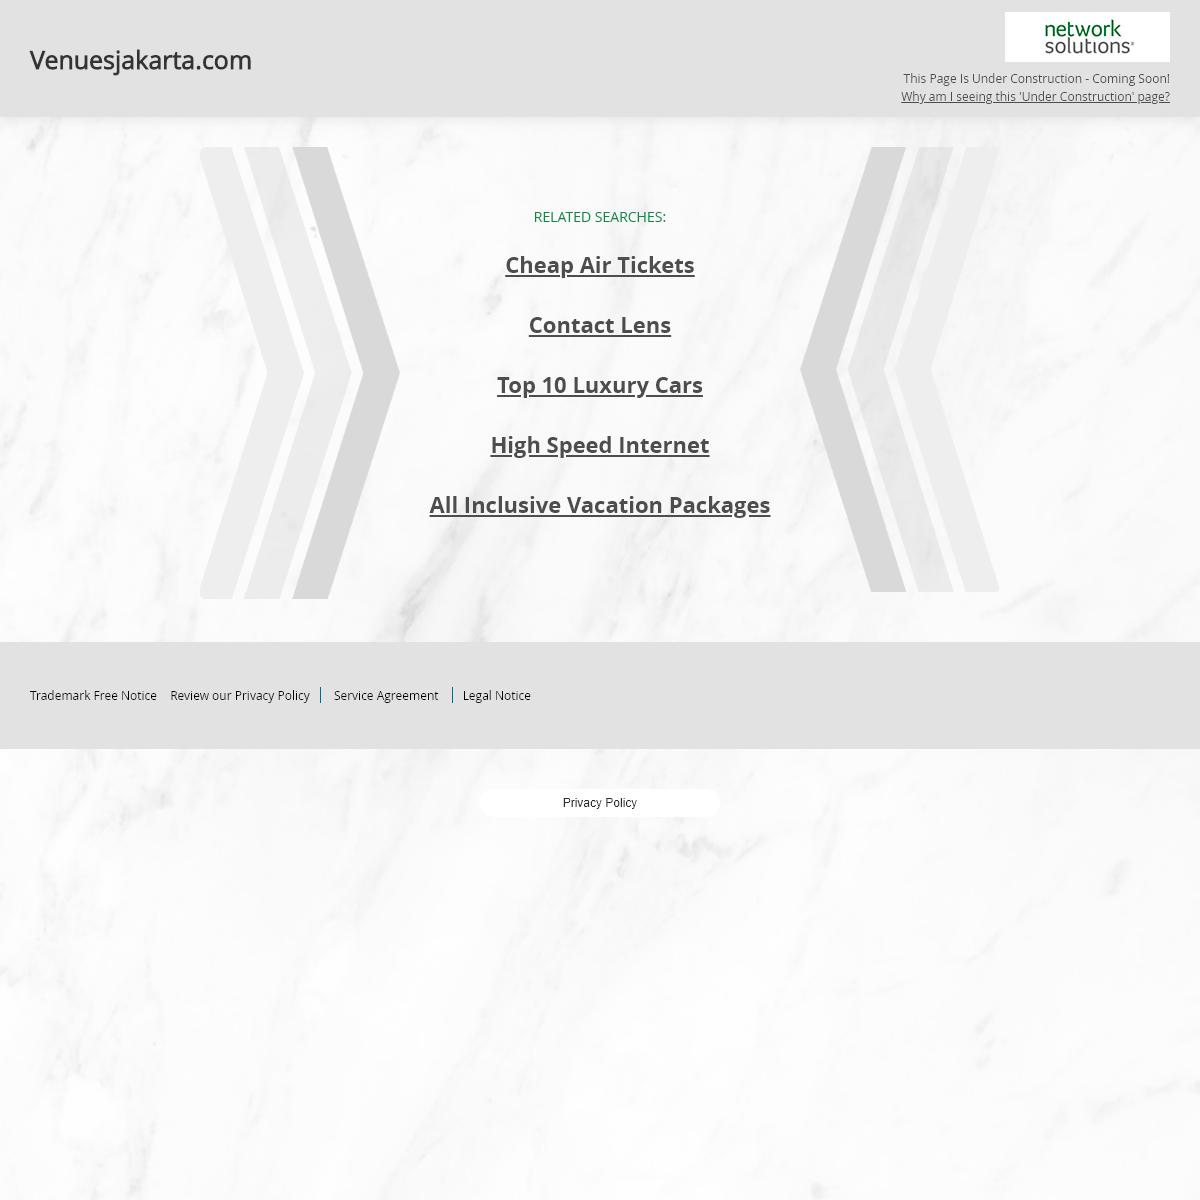 Venuesjakarta.com